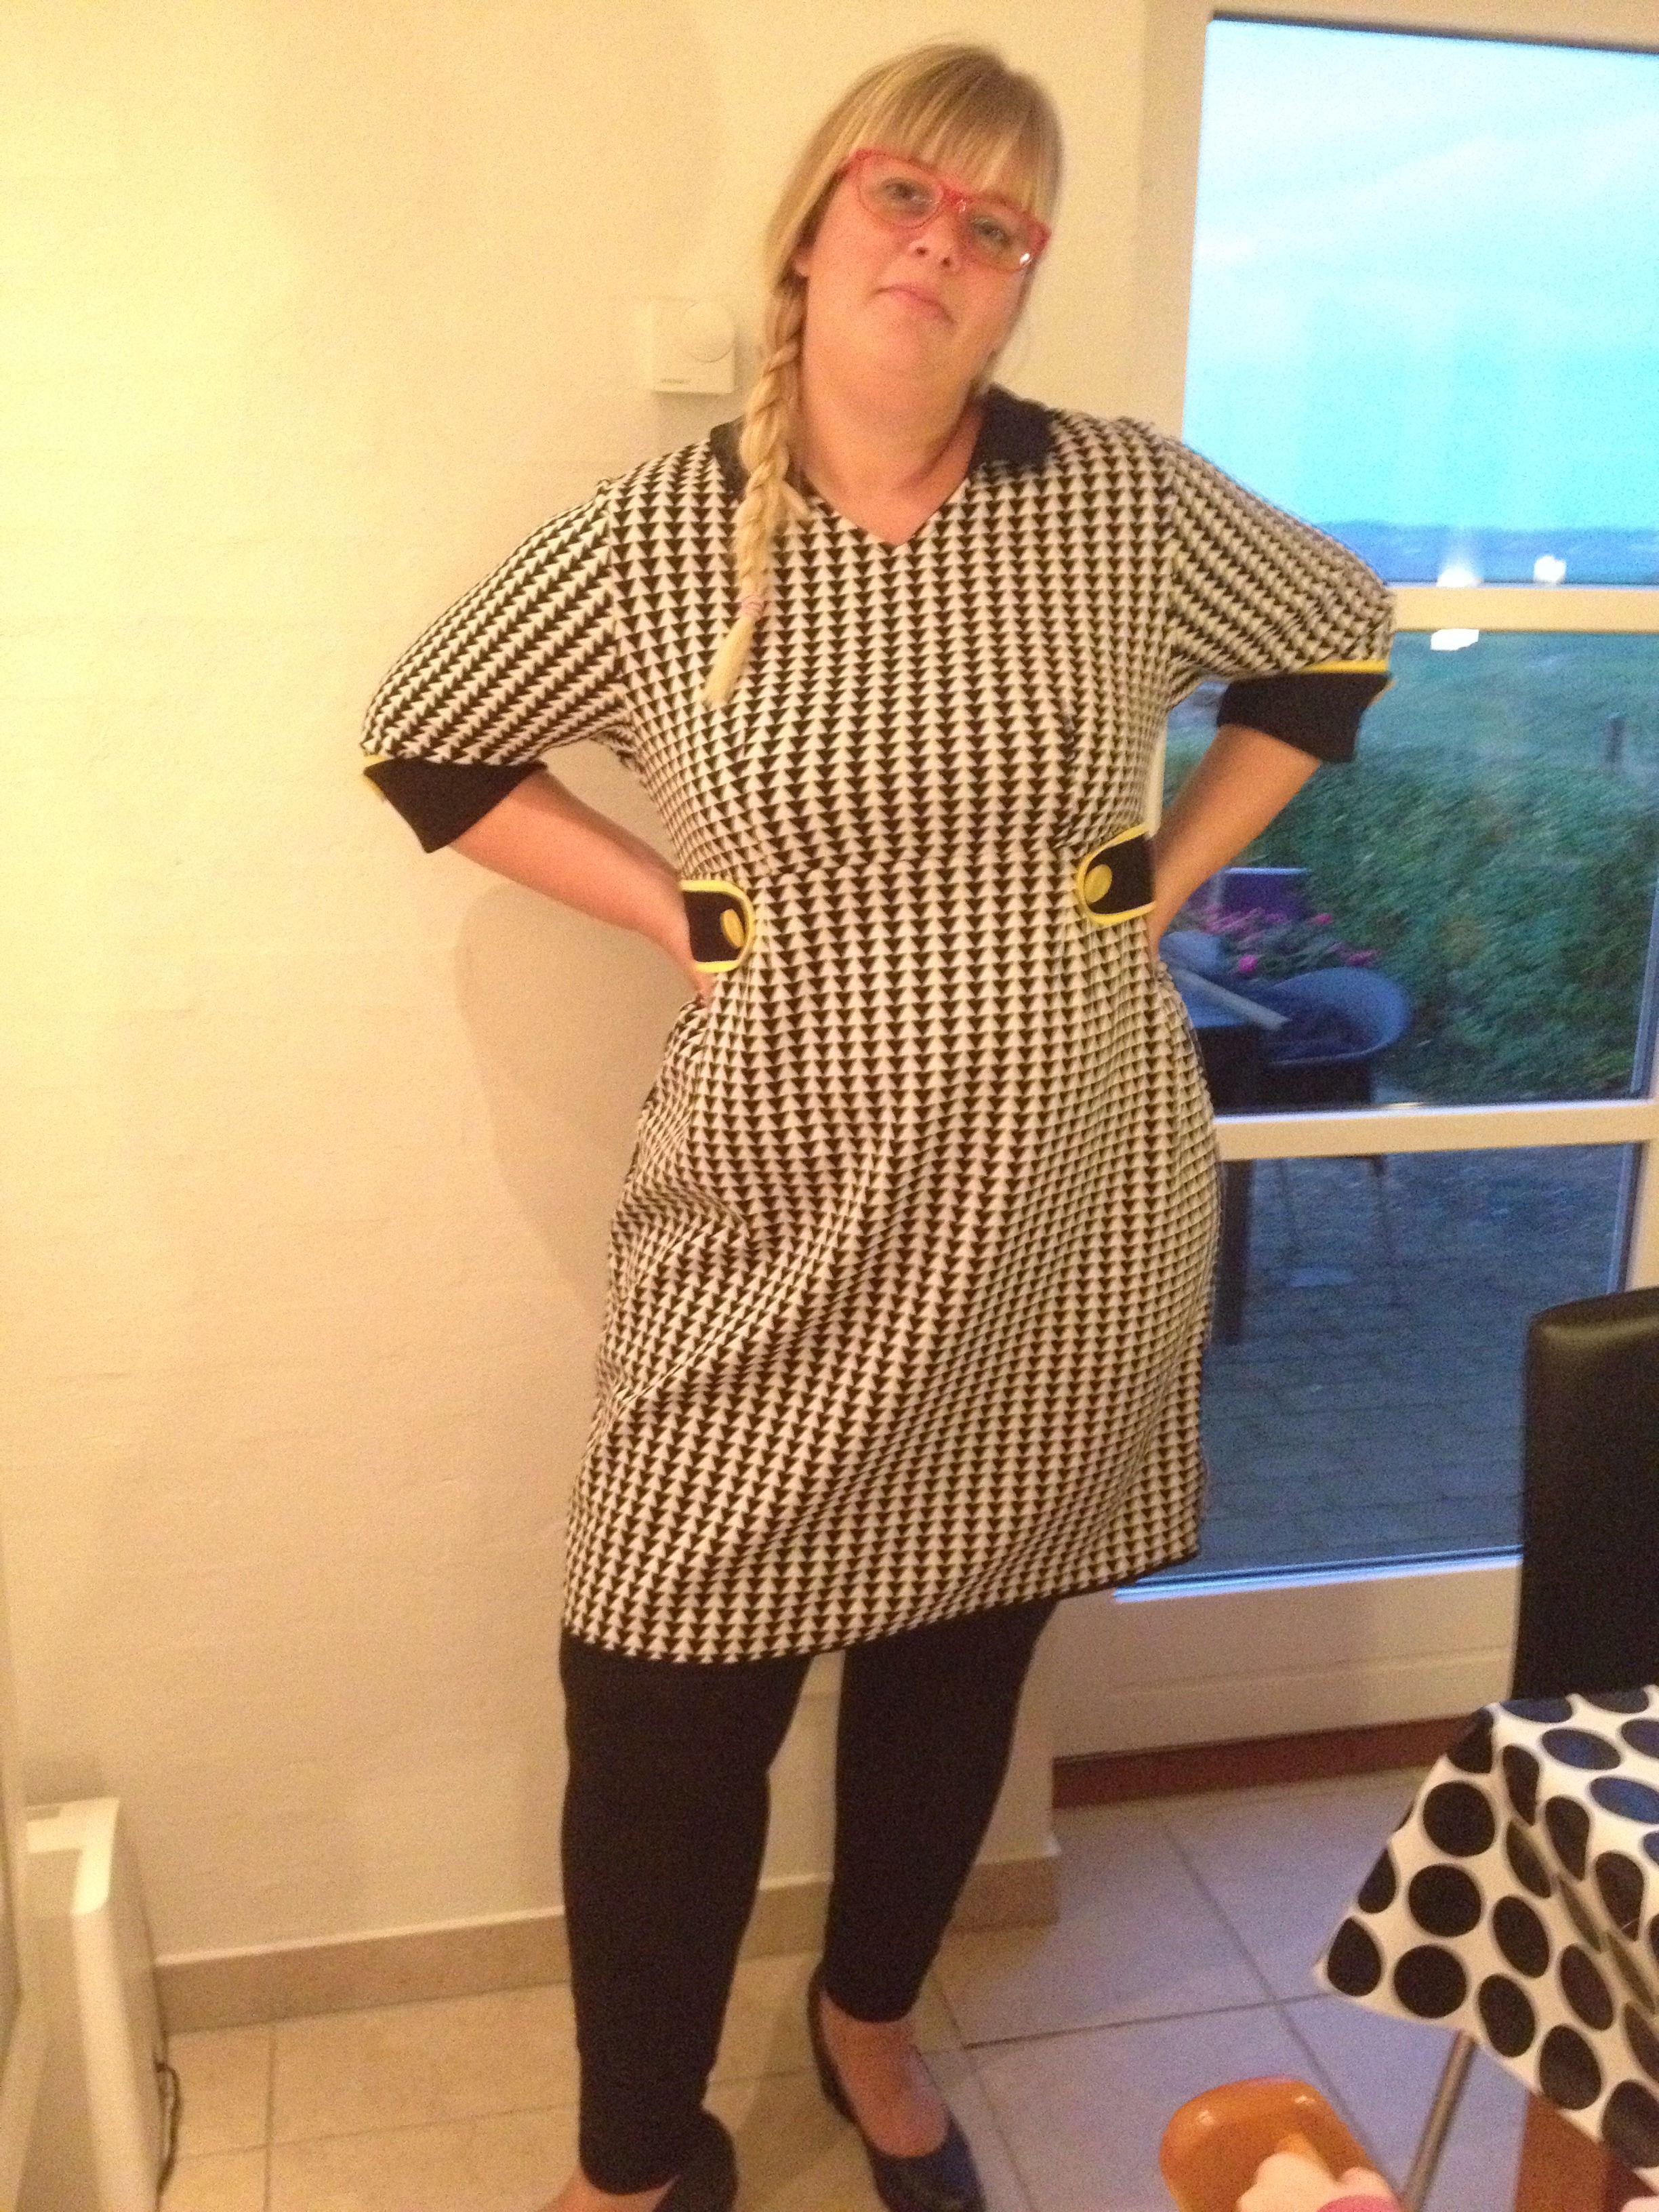 Få syet de smarteste kjoler. Sidder perfekt også på plys piger! Tjek hjemmesiden www.bythorvig.dk